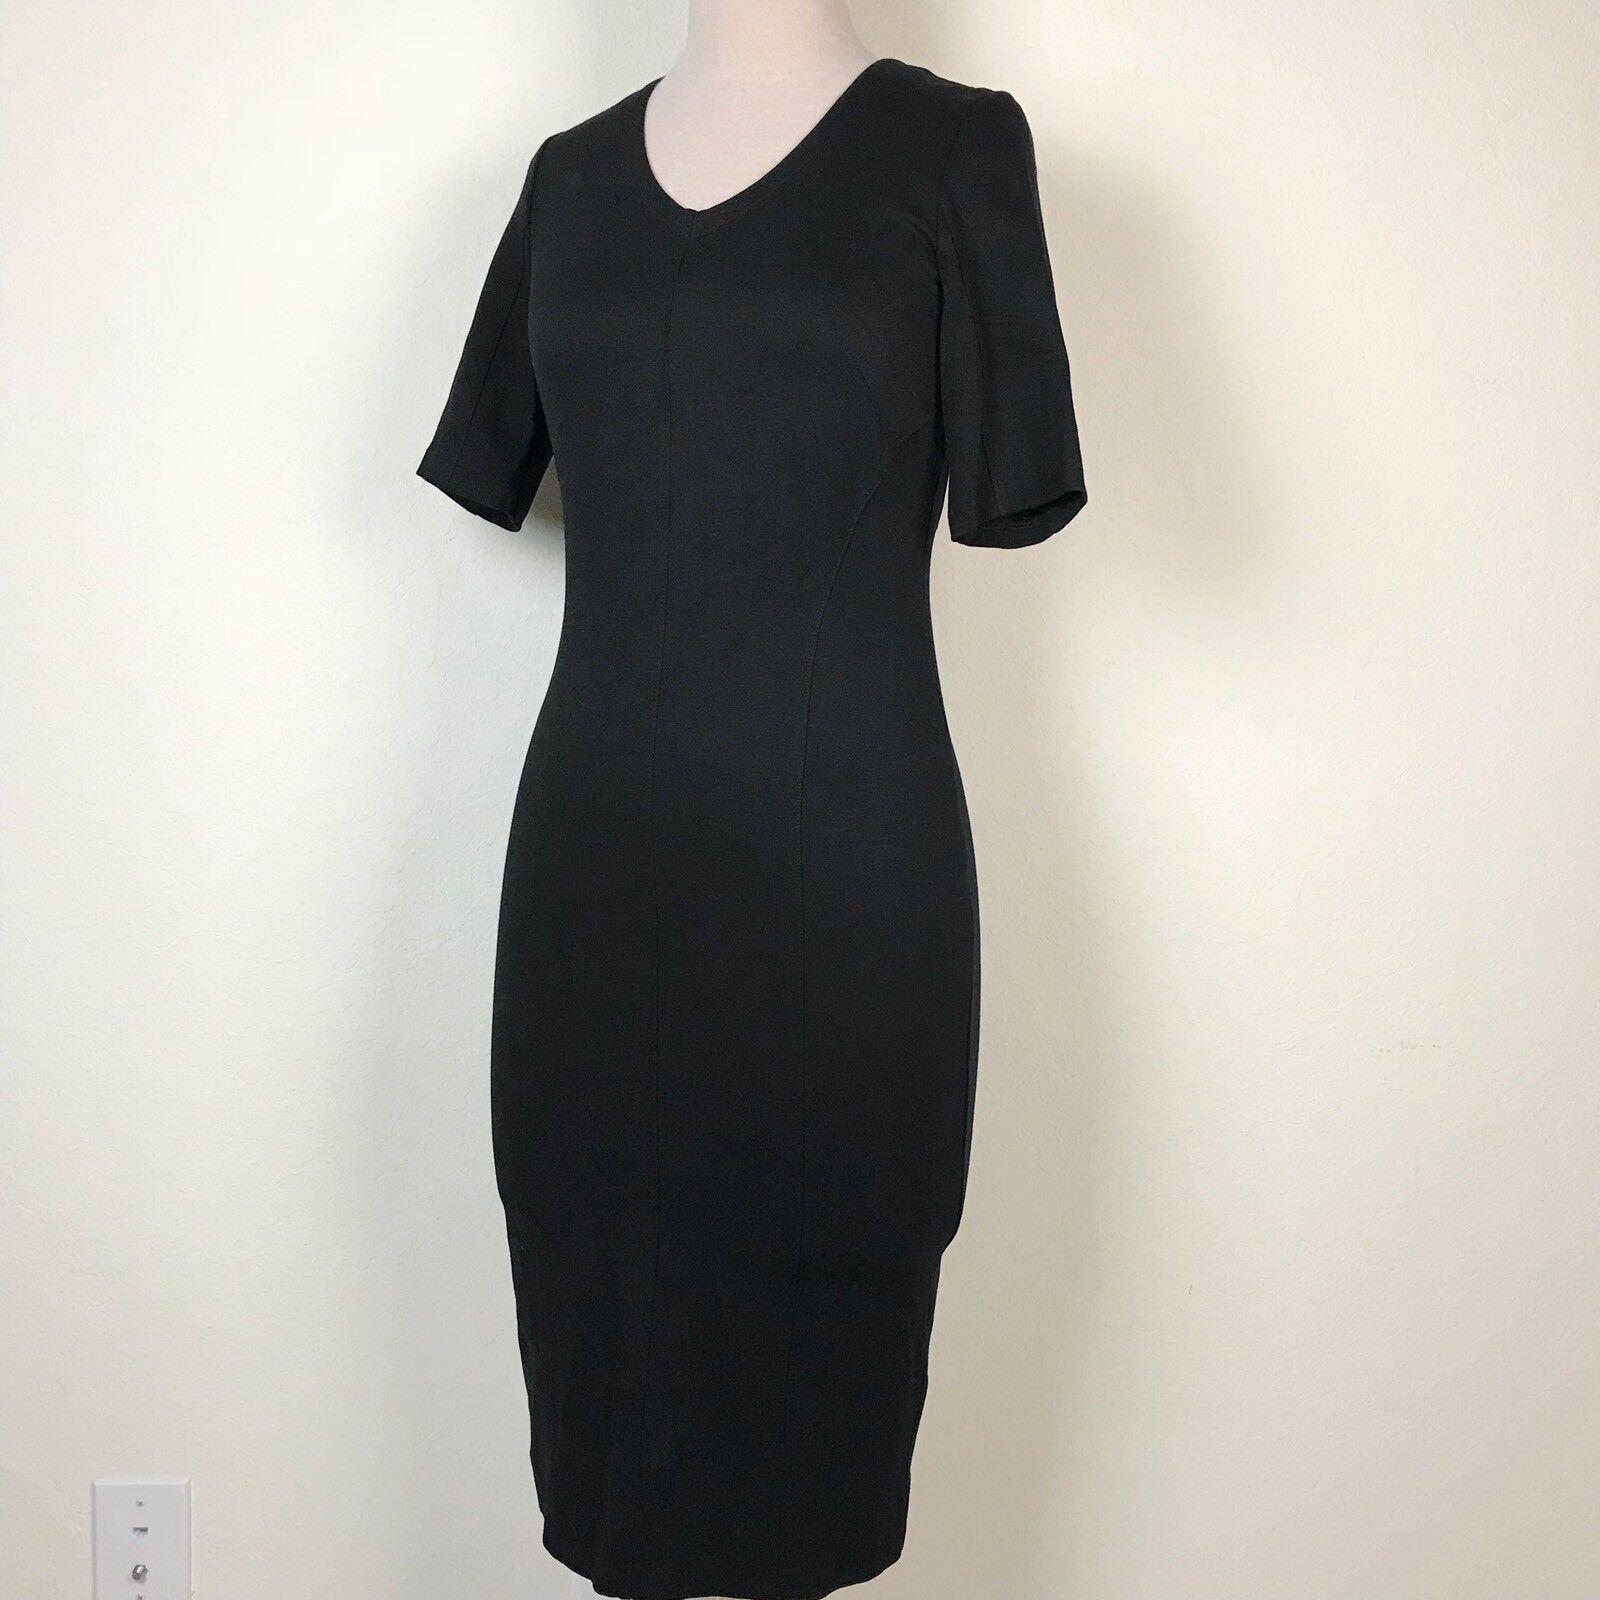 Cabi Claire Black Dress Career Evening LBD #3101 … - image 2